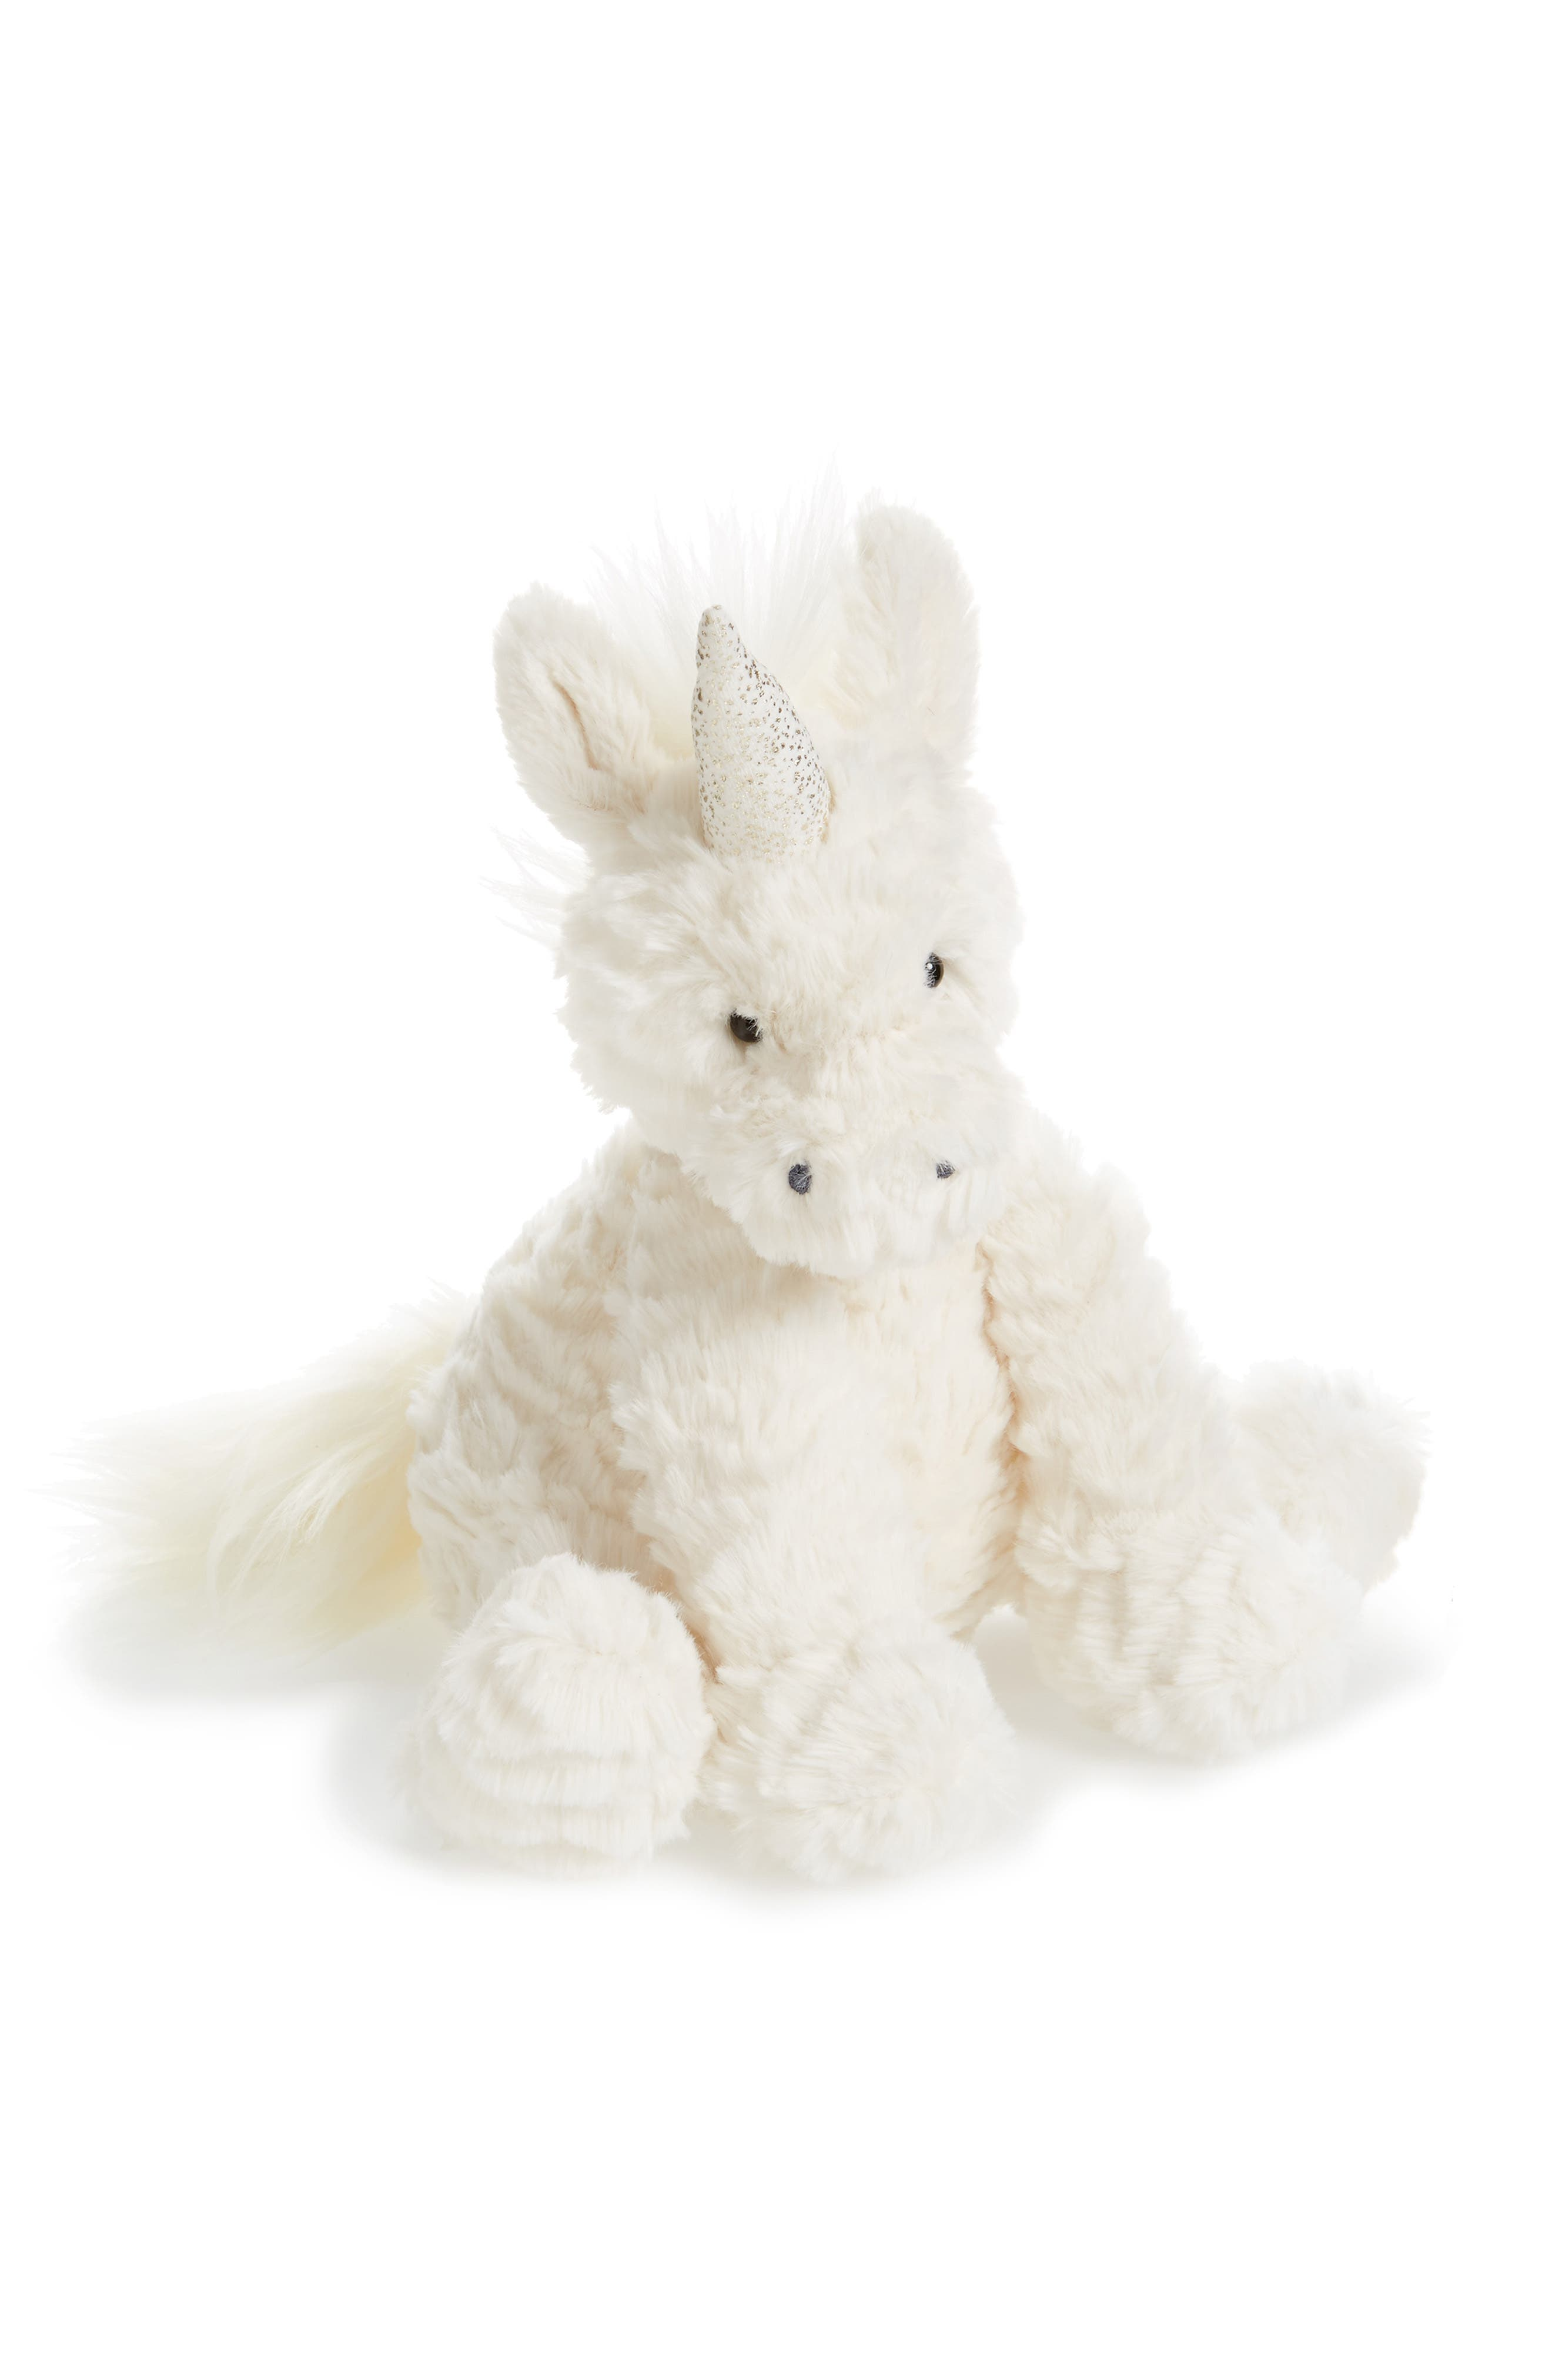 Jellycat Fuddlewuddle Medium Unicorn Stuffed Animal